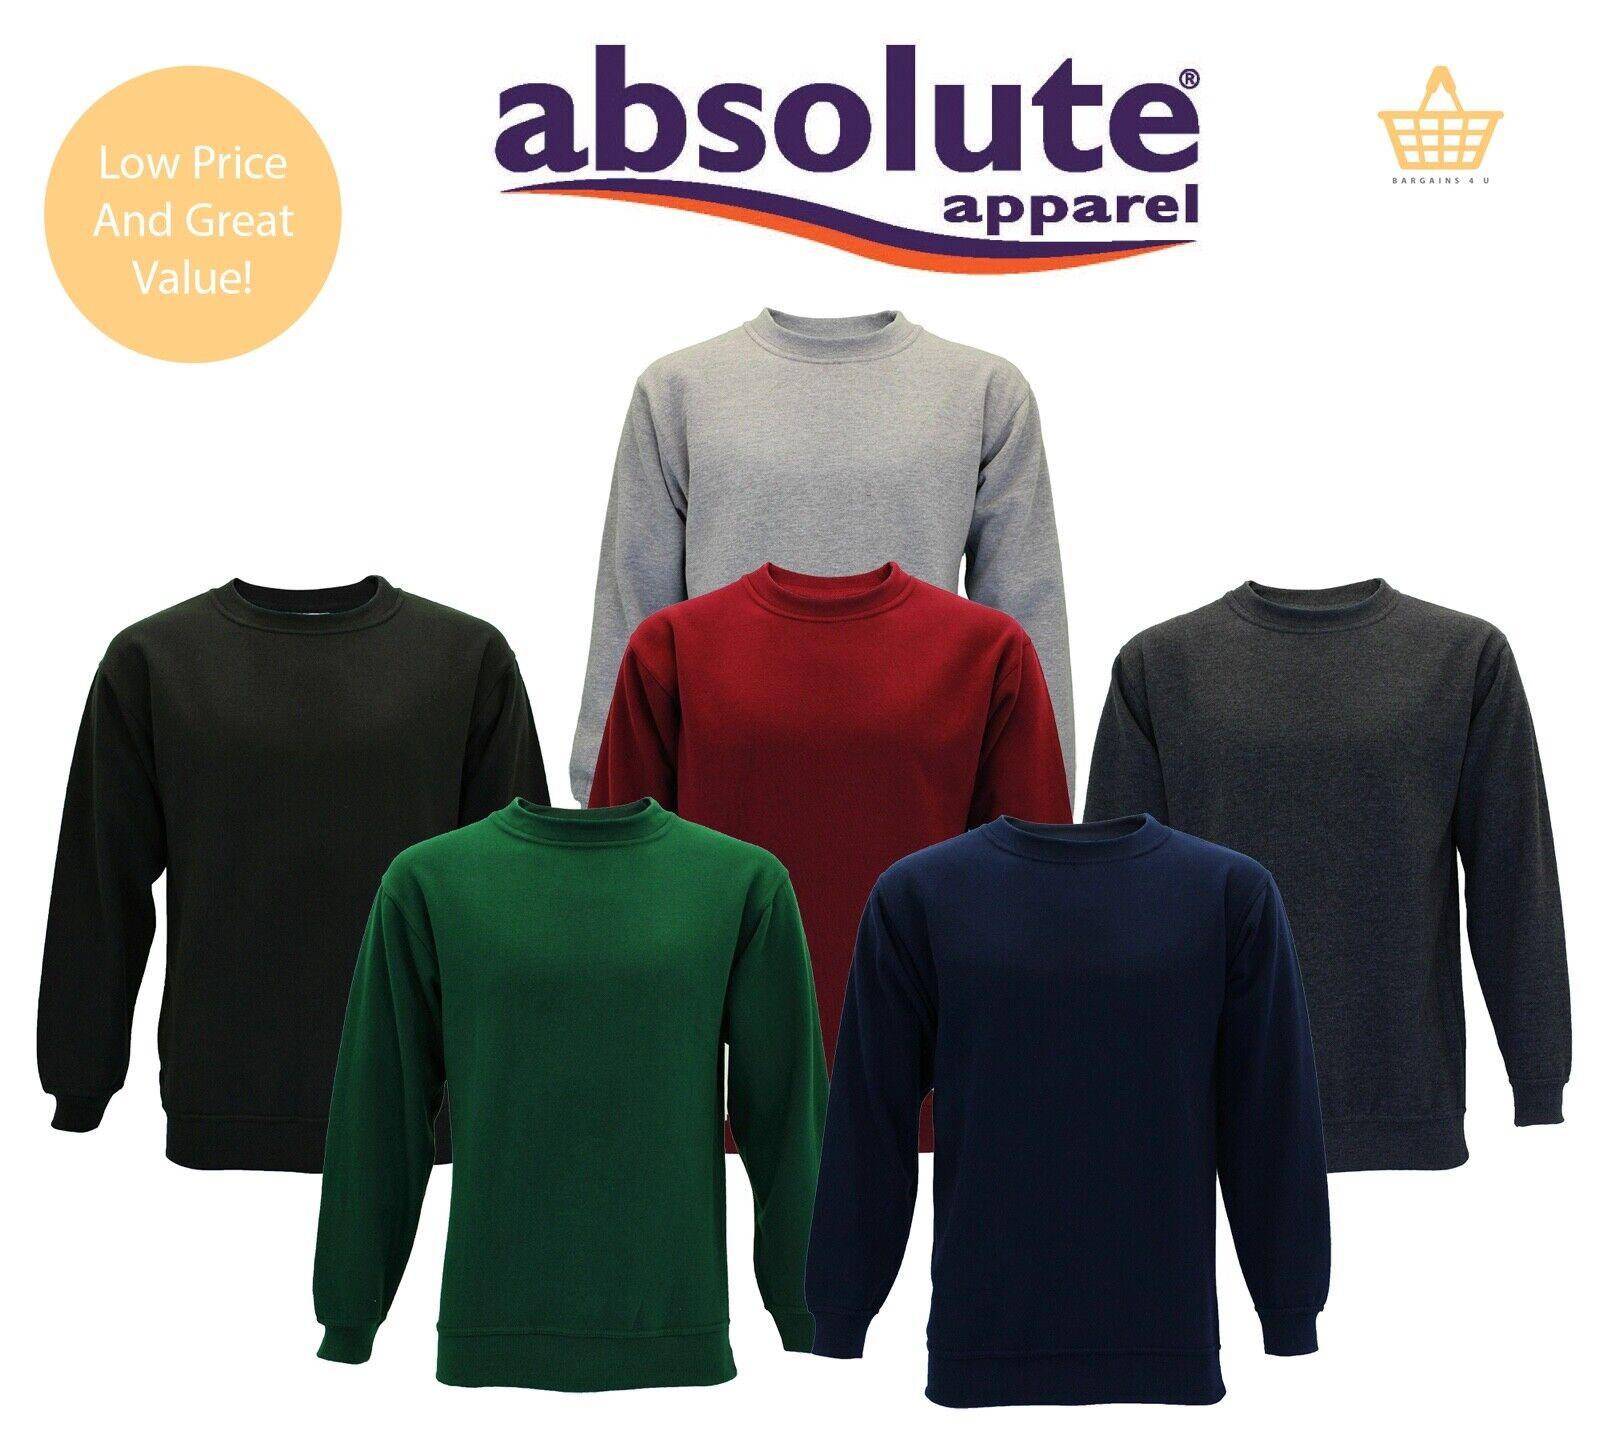 Mens Plain Jumper Sweatshirt Jersey Sweater Pullover Work Casual Leisure Top